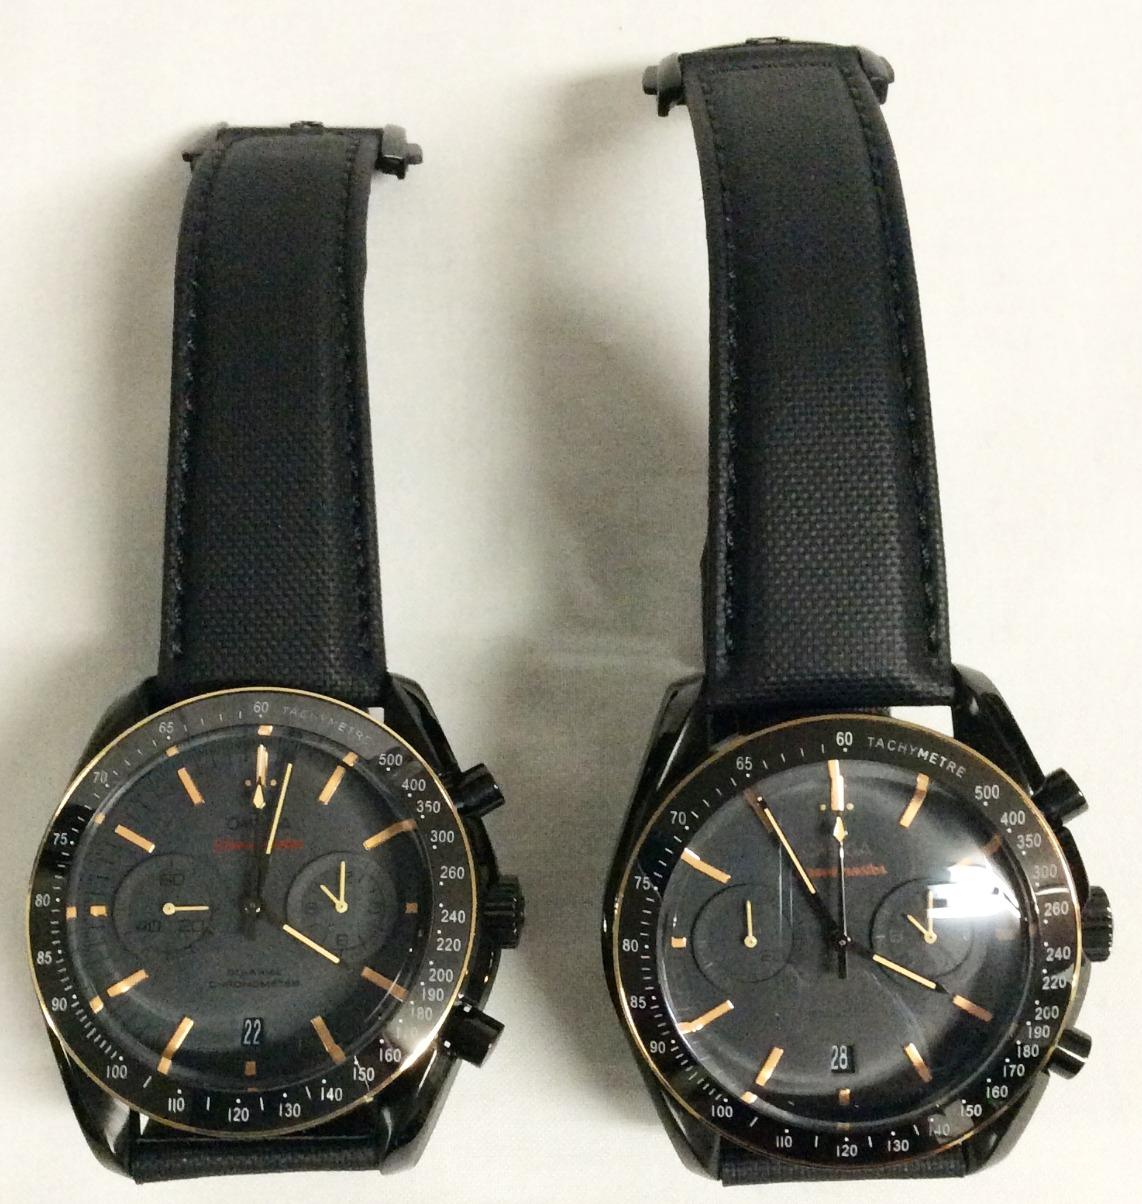 Seamaster Watches